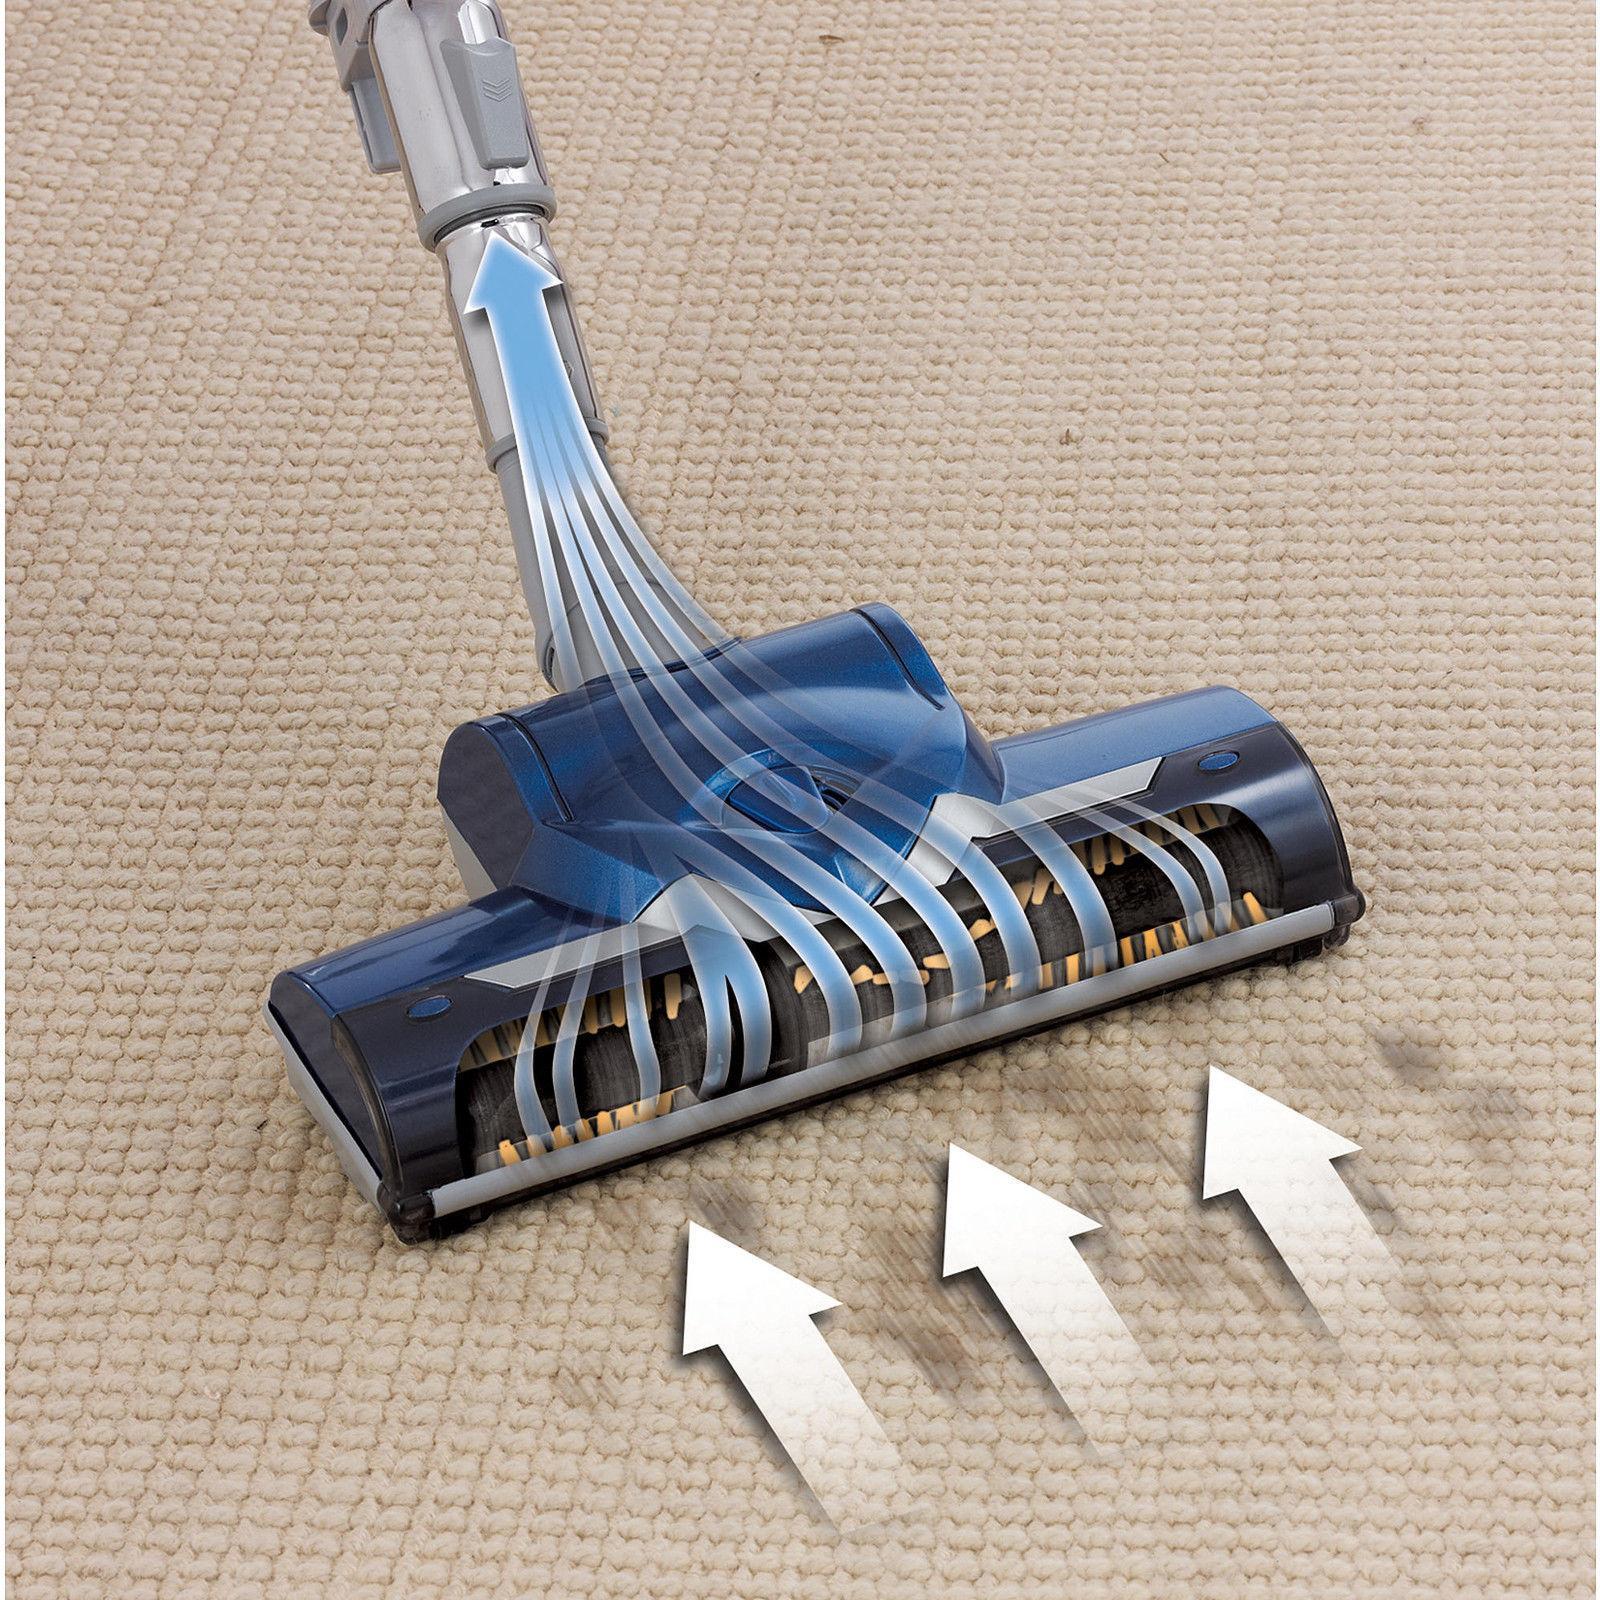 Kenmore Canister w/ Turbine Brush -